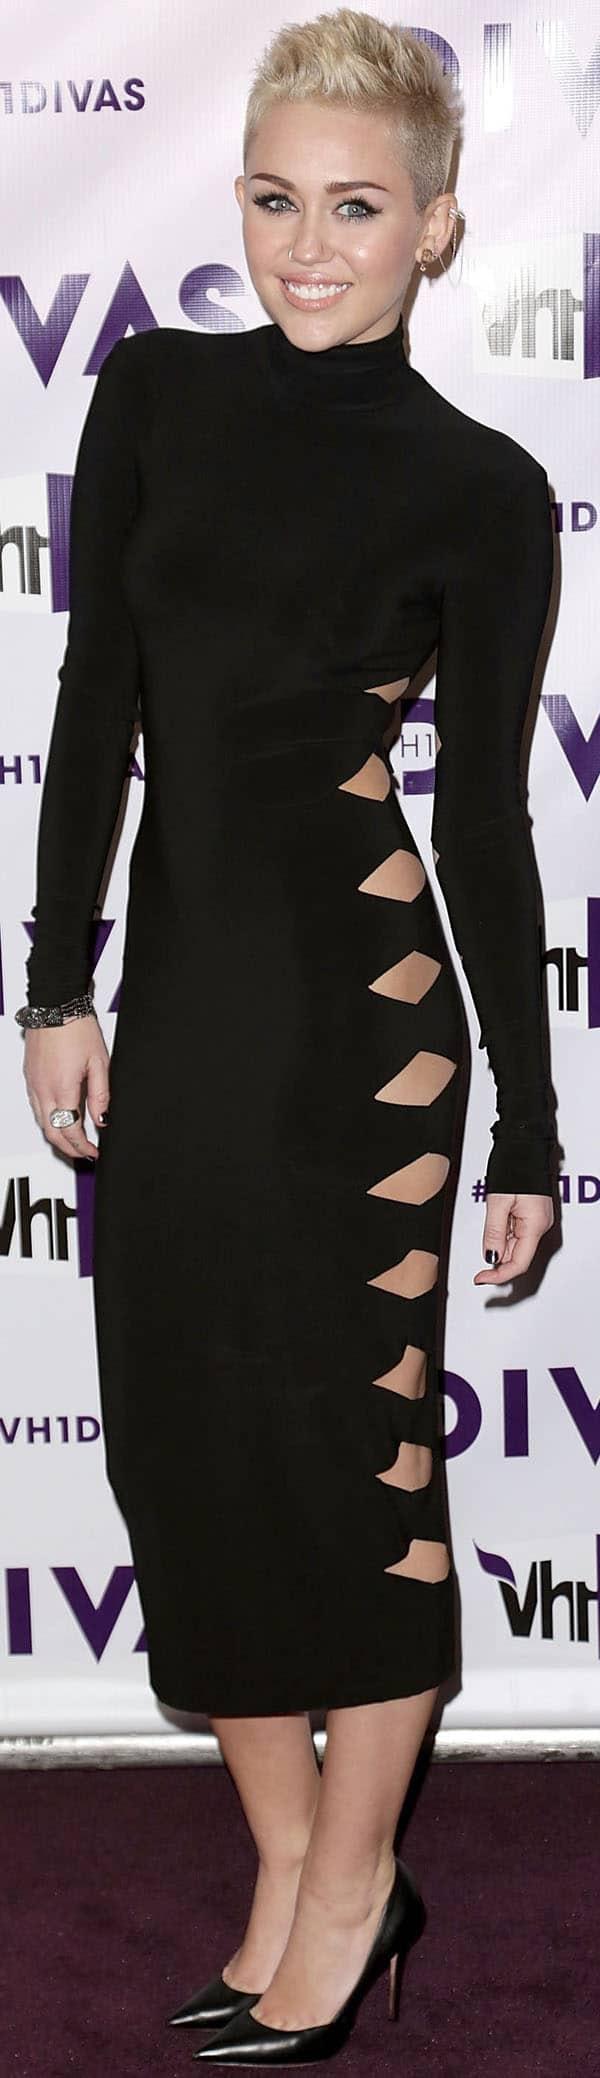 Miley Cyrus' Omo by Norma Kamali black turtleneck dress